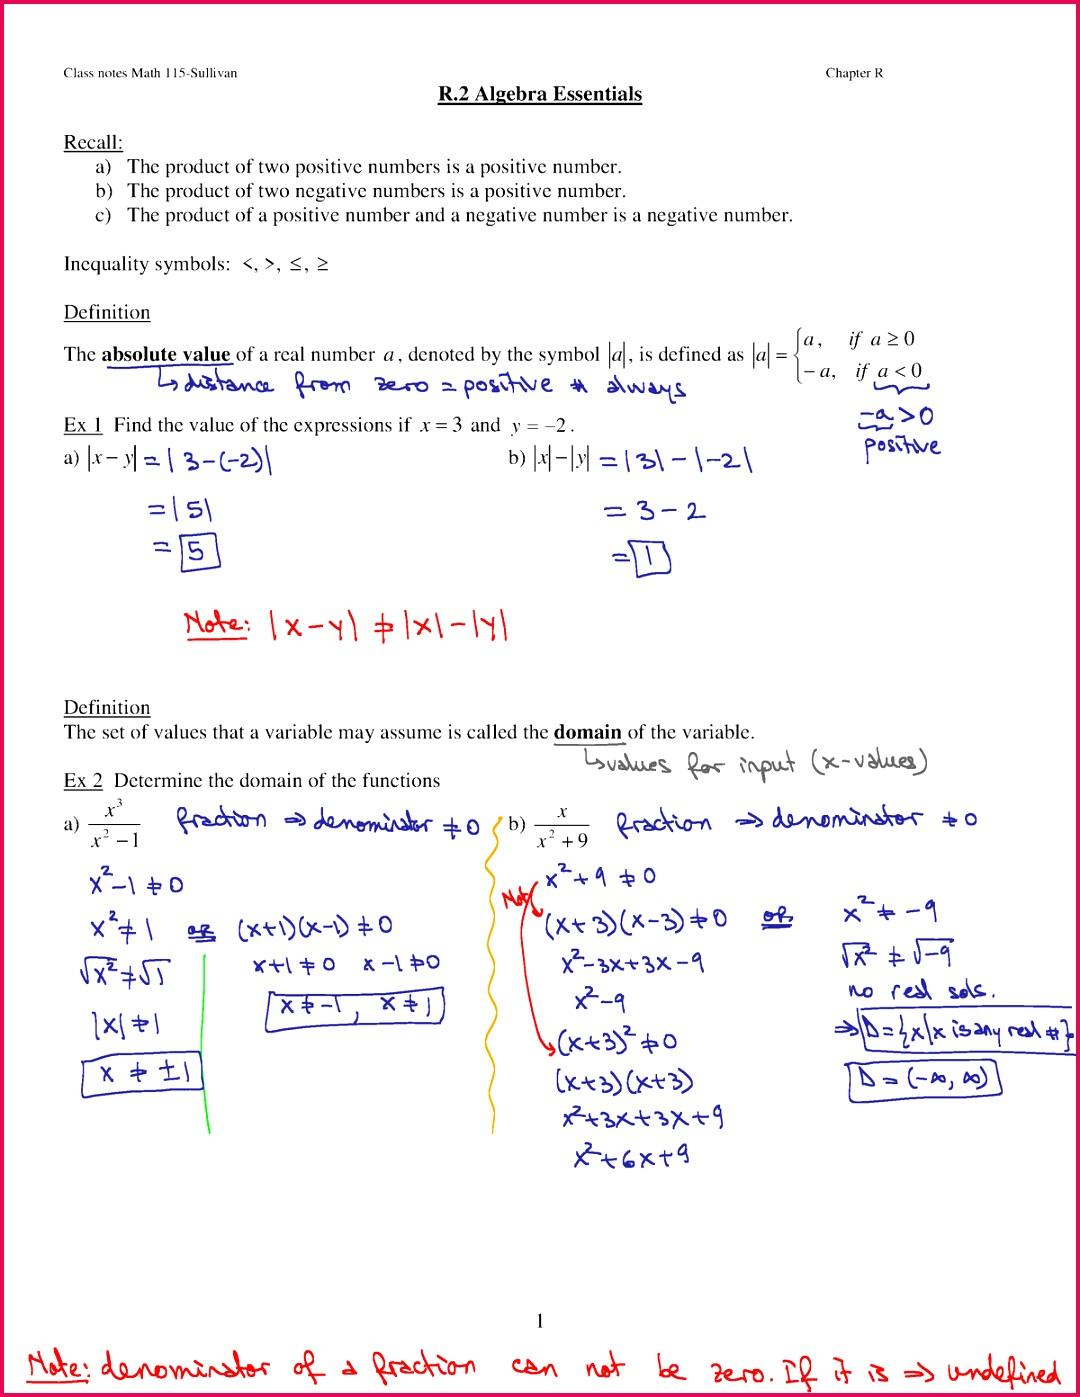 Class 10 Notes Quadratic Equation Exercise 1 2